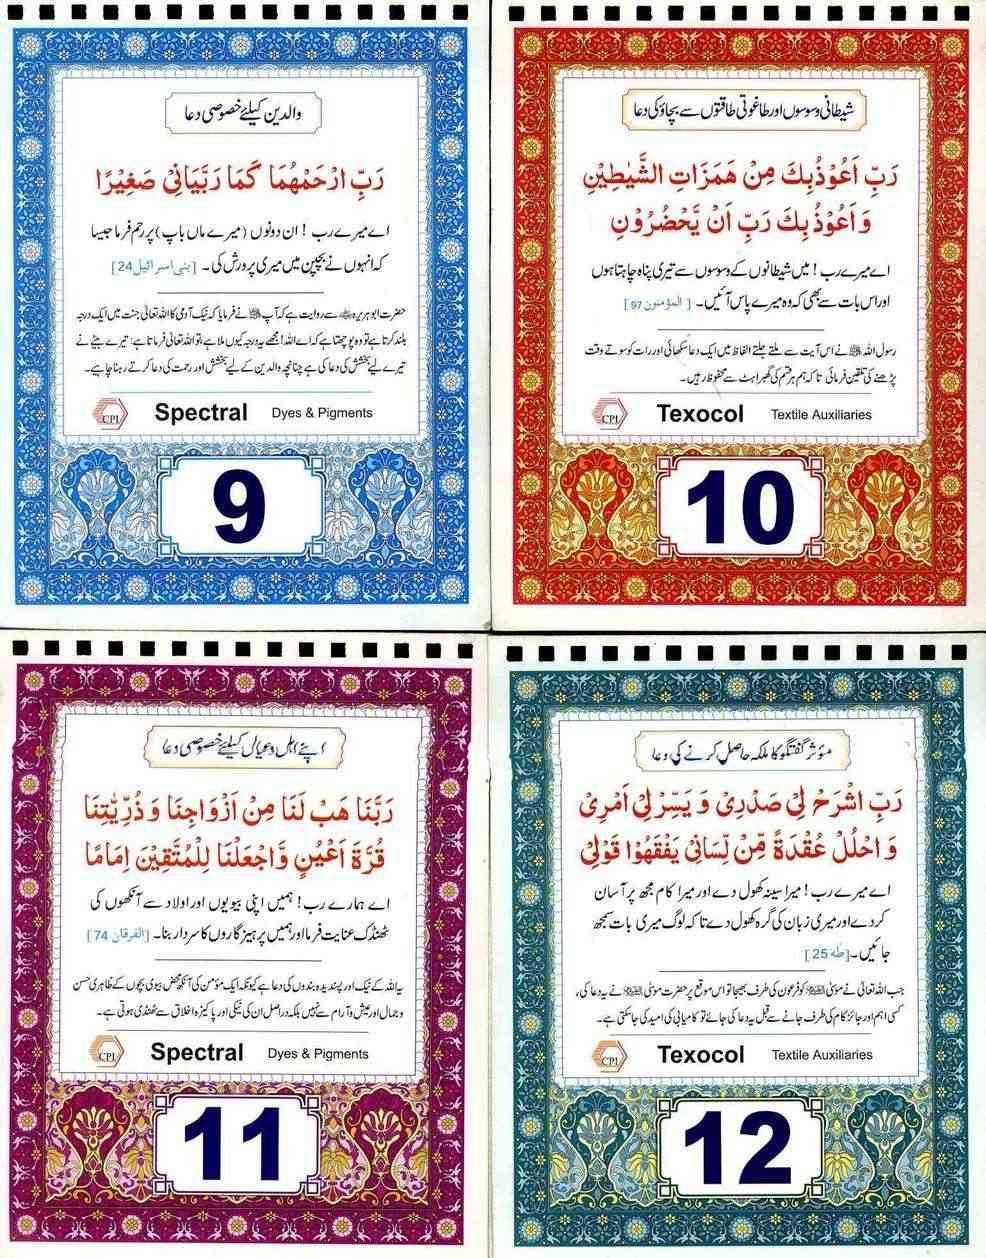 DUA - A set of Powerful Qurani Duaa's,,,,,,,,,,,,,,, Secure16